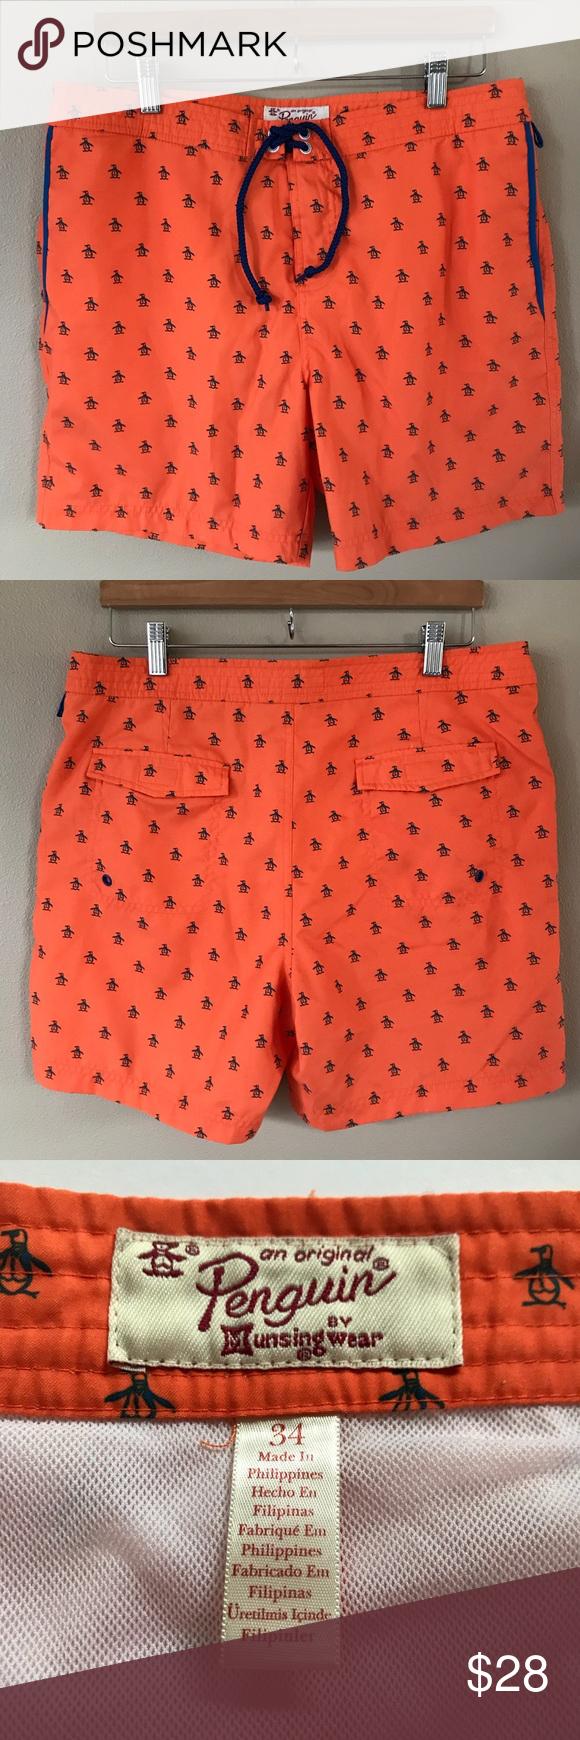 Original Penguin Volley Swim Trunks Shorts Sz 34 Beachwear Collection Original Penguin Printed Swim